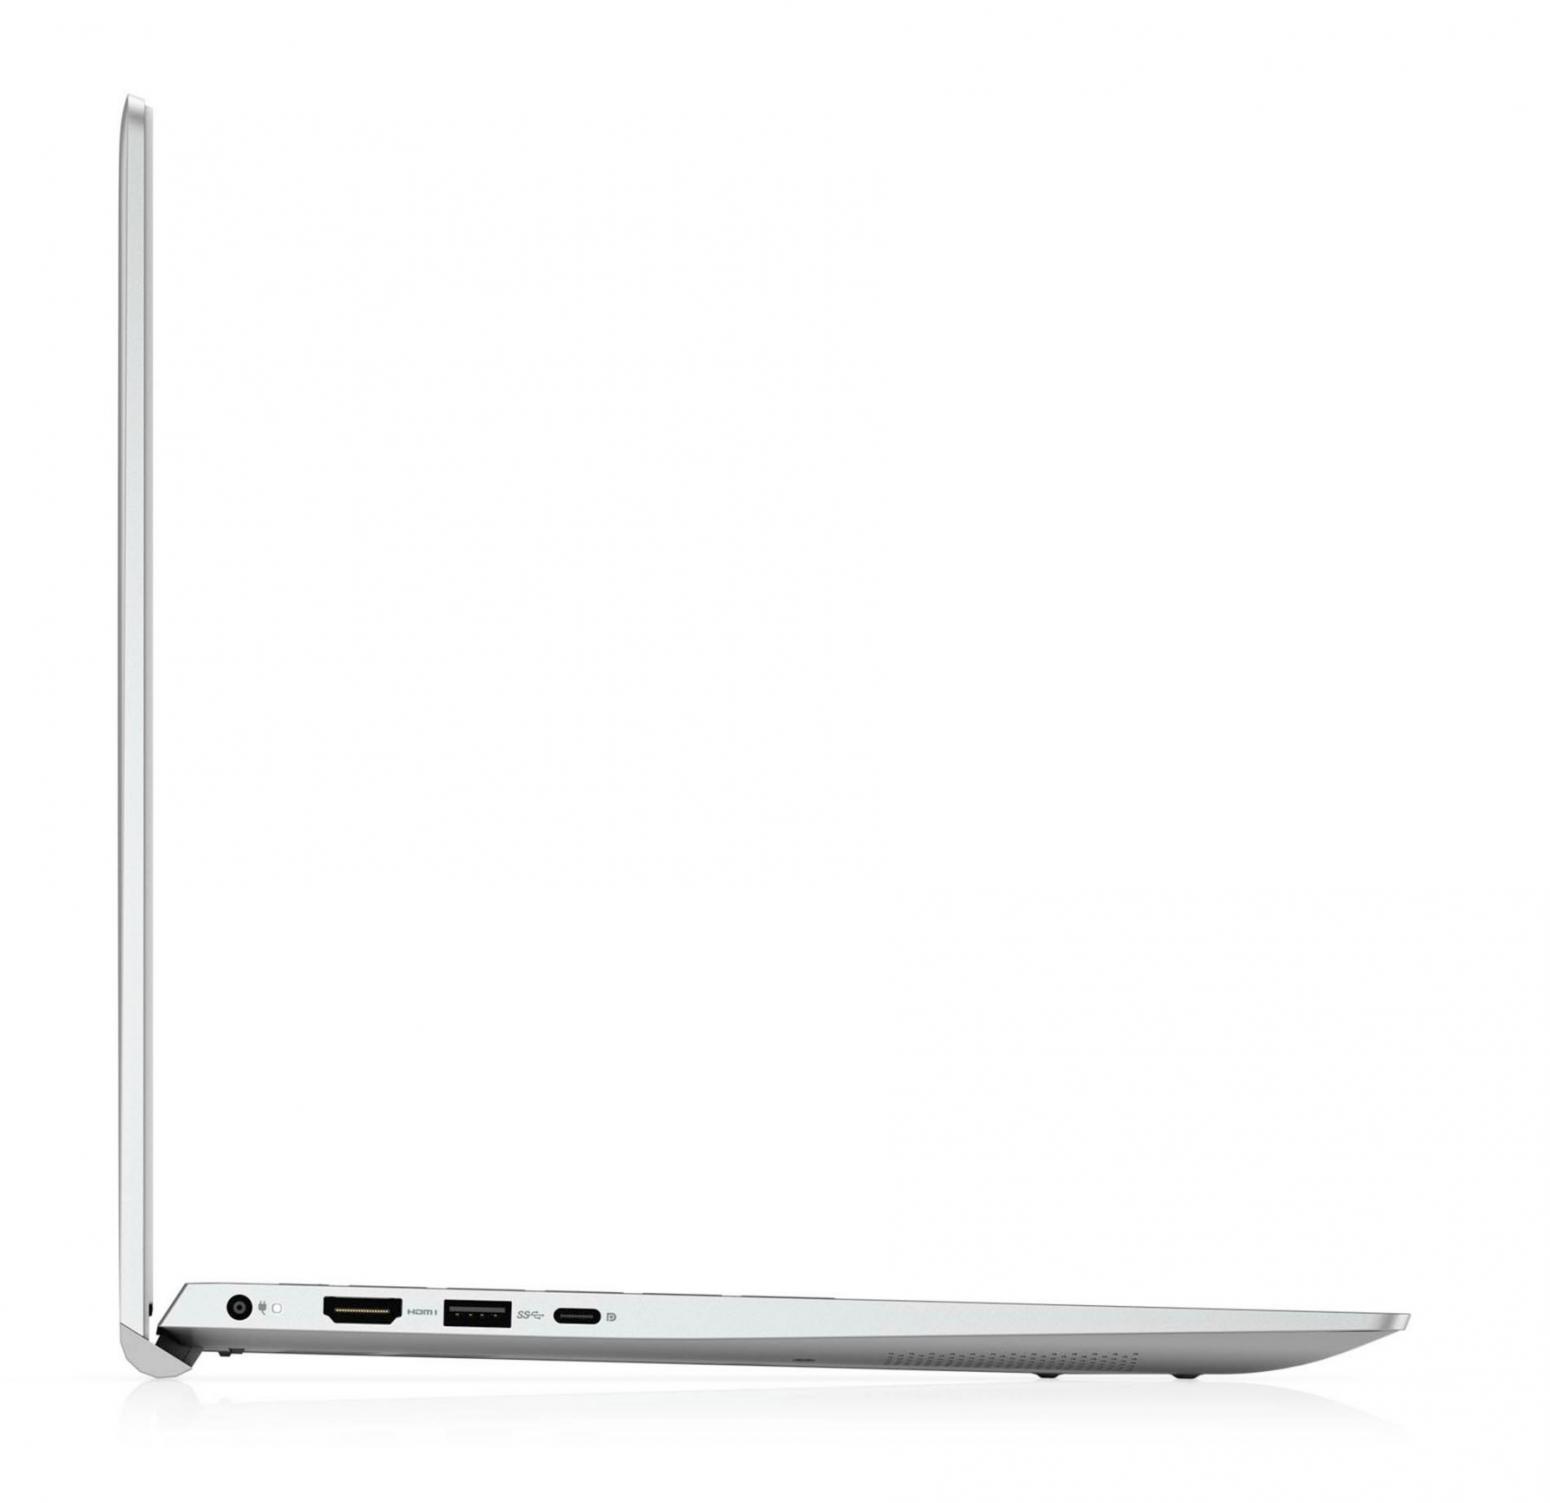 Ordinateur portable Dell Inspiron 15 5502 Argent - Core i5, SSD 256 Go - photo 8